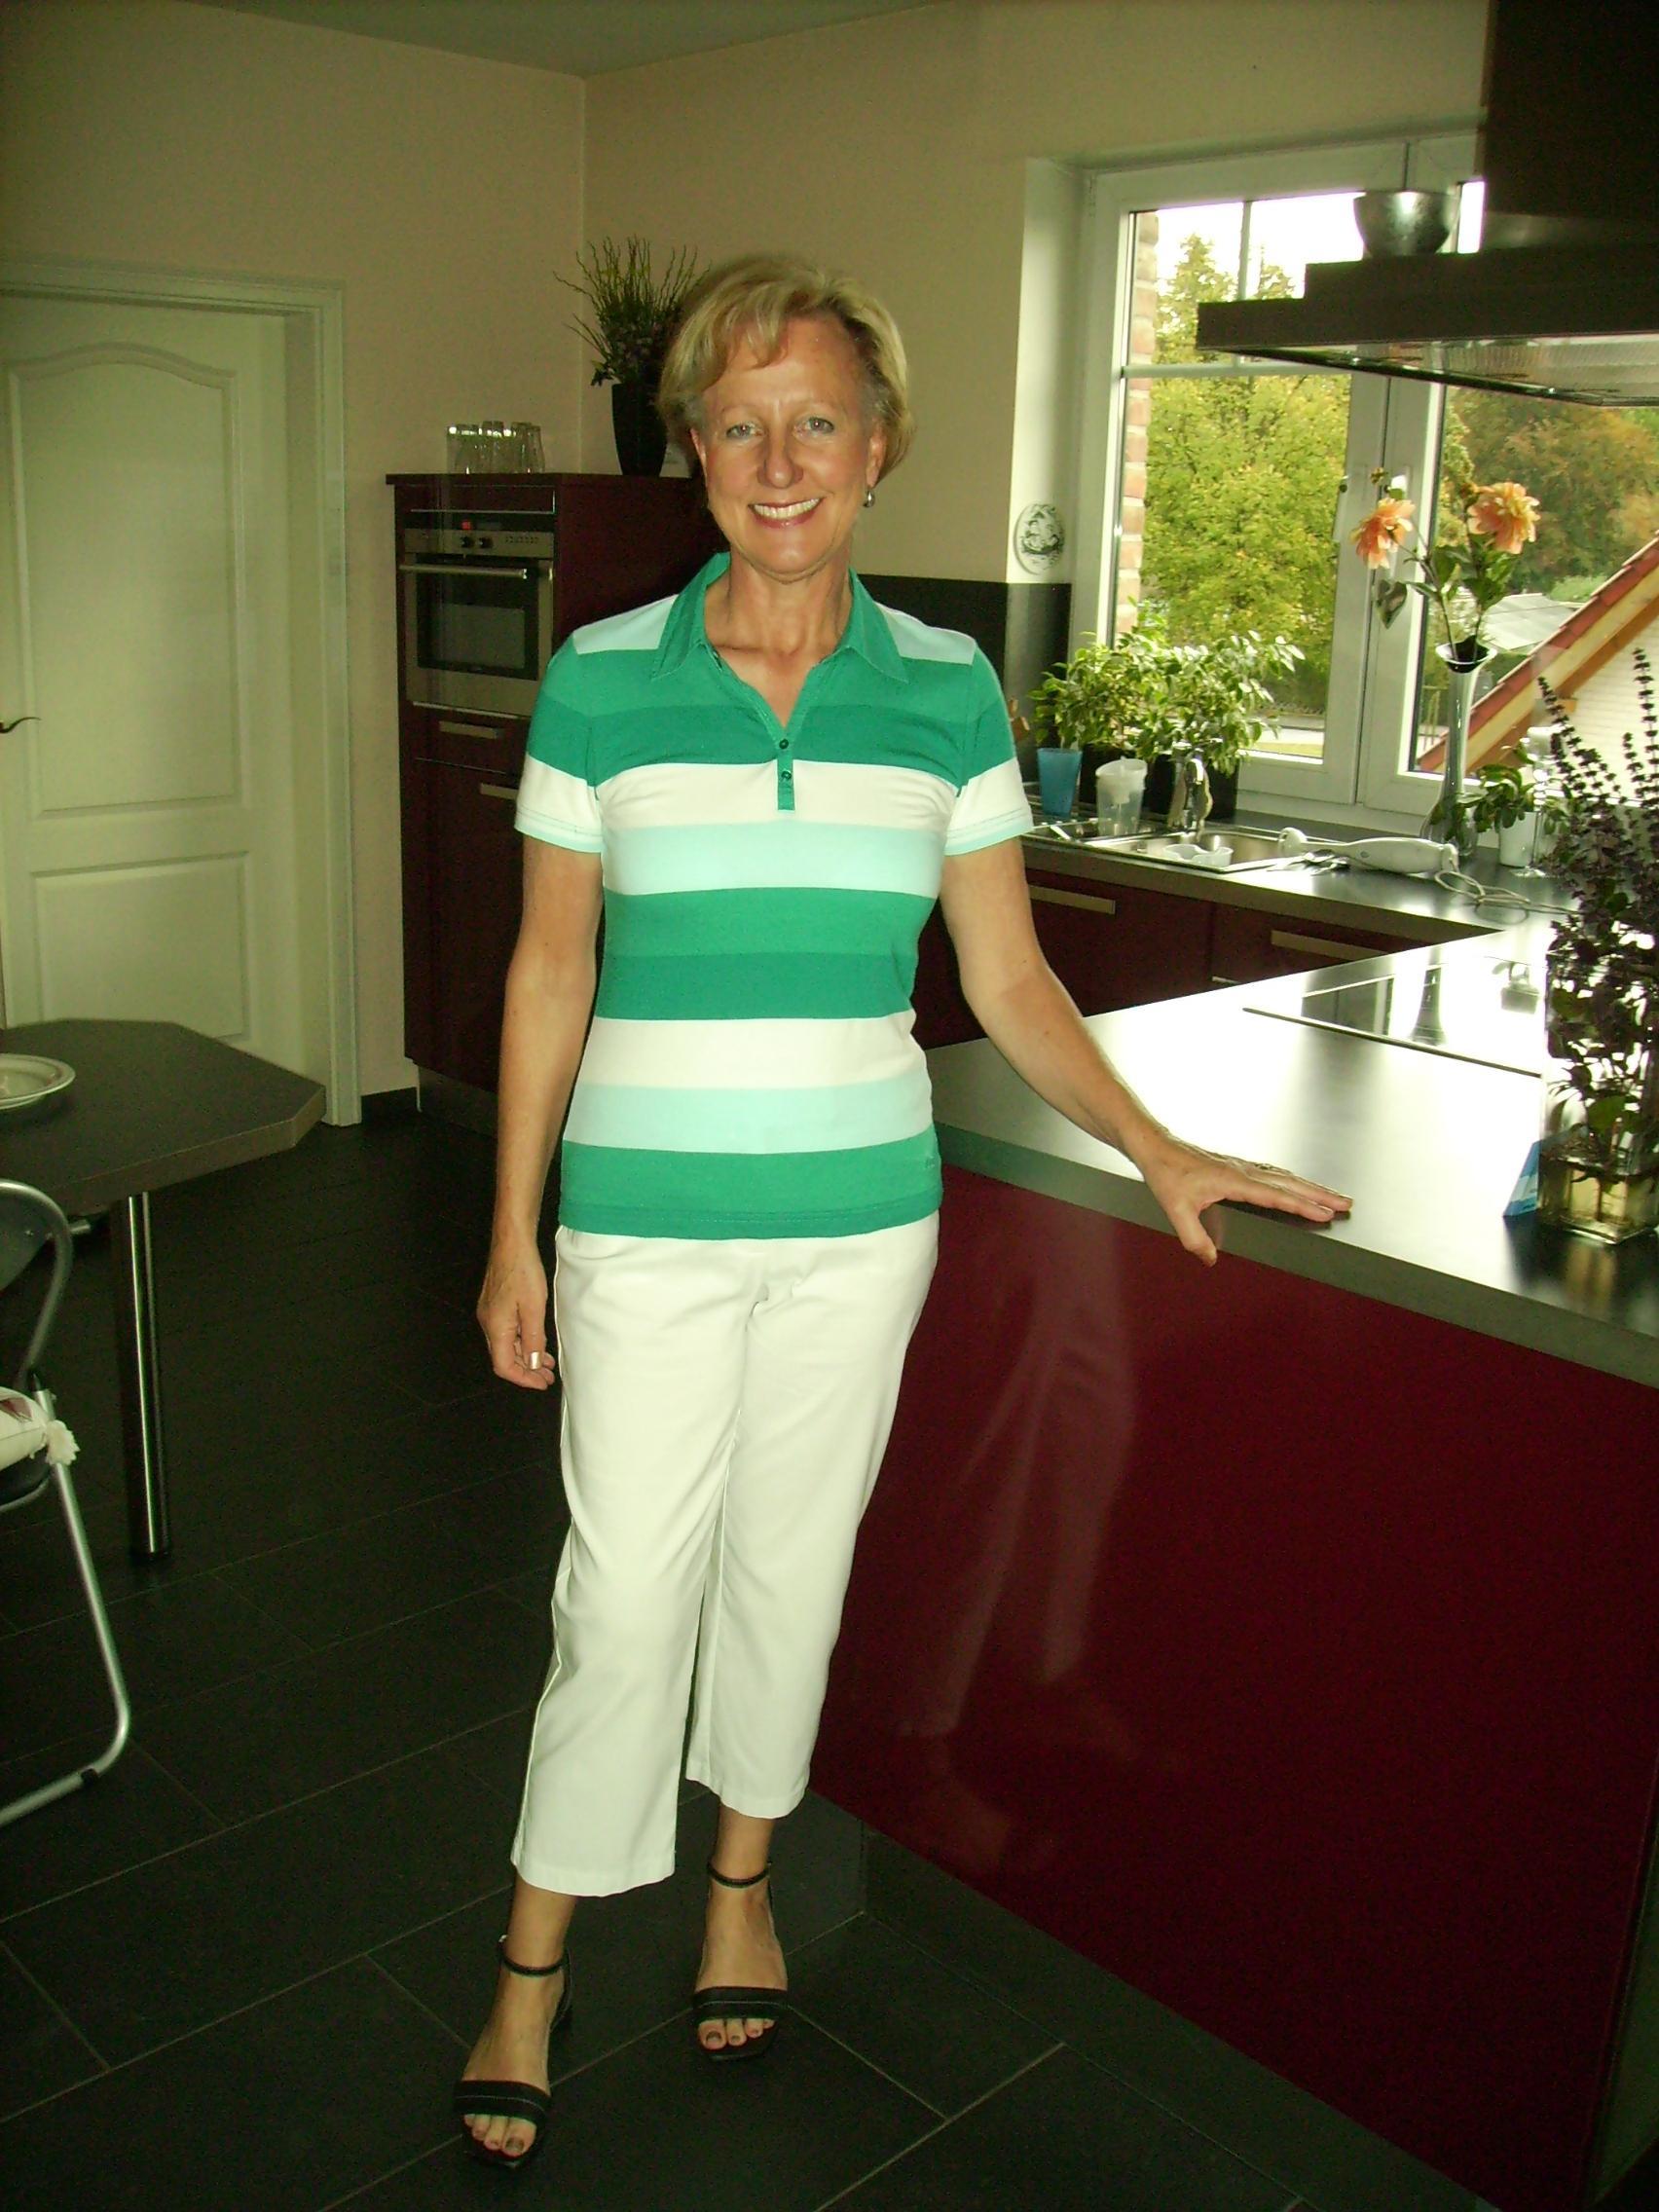 Brigitte Hüttner